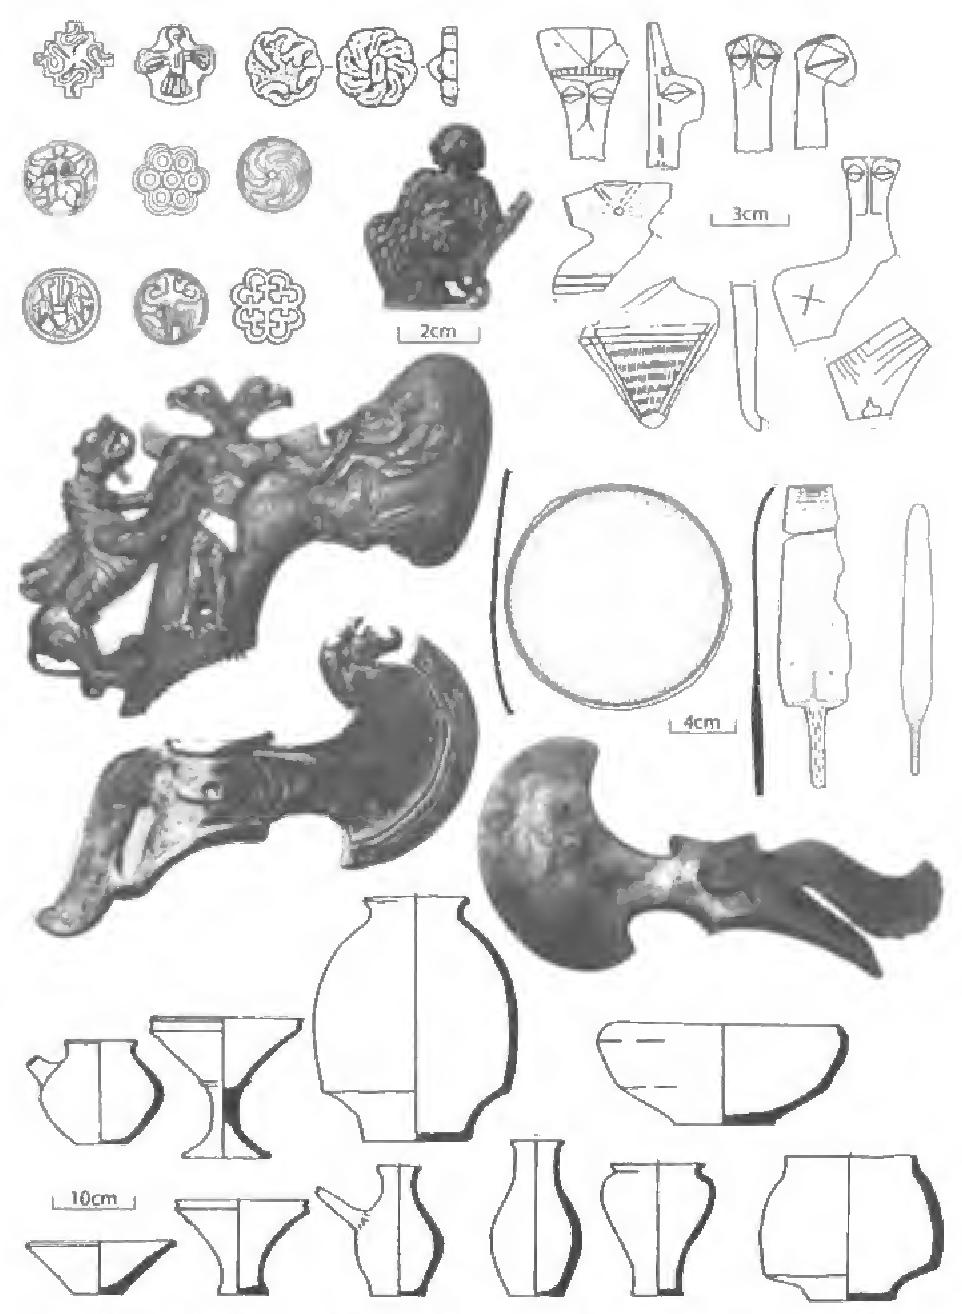 figure 16.5